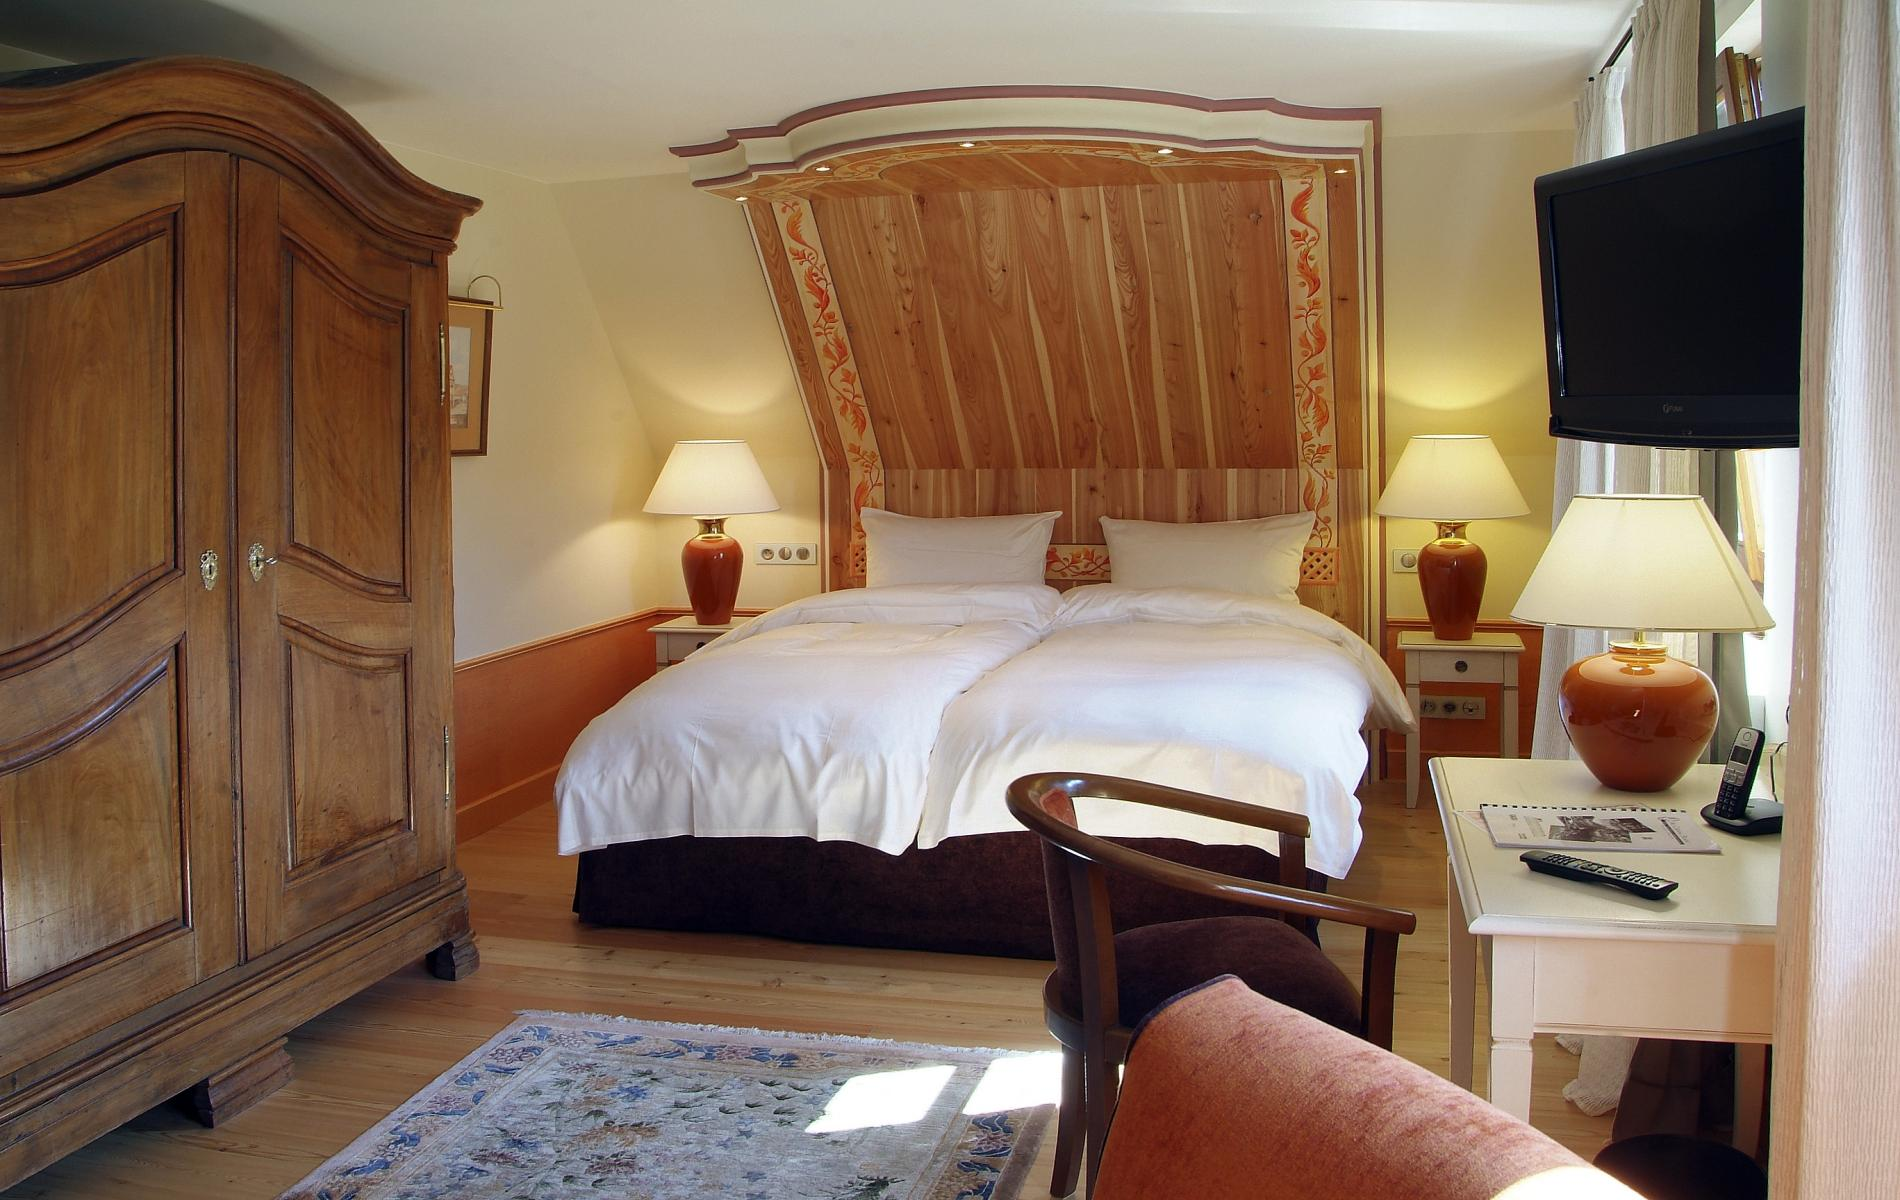 Chambres hotel niedersteinbach entre bitche et wissembourg - Hotel lyon chambre 4 personnes ...